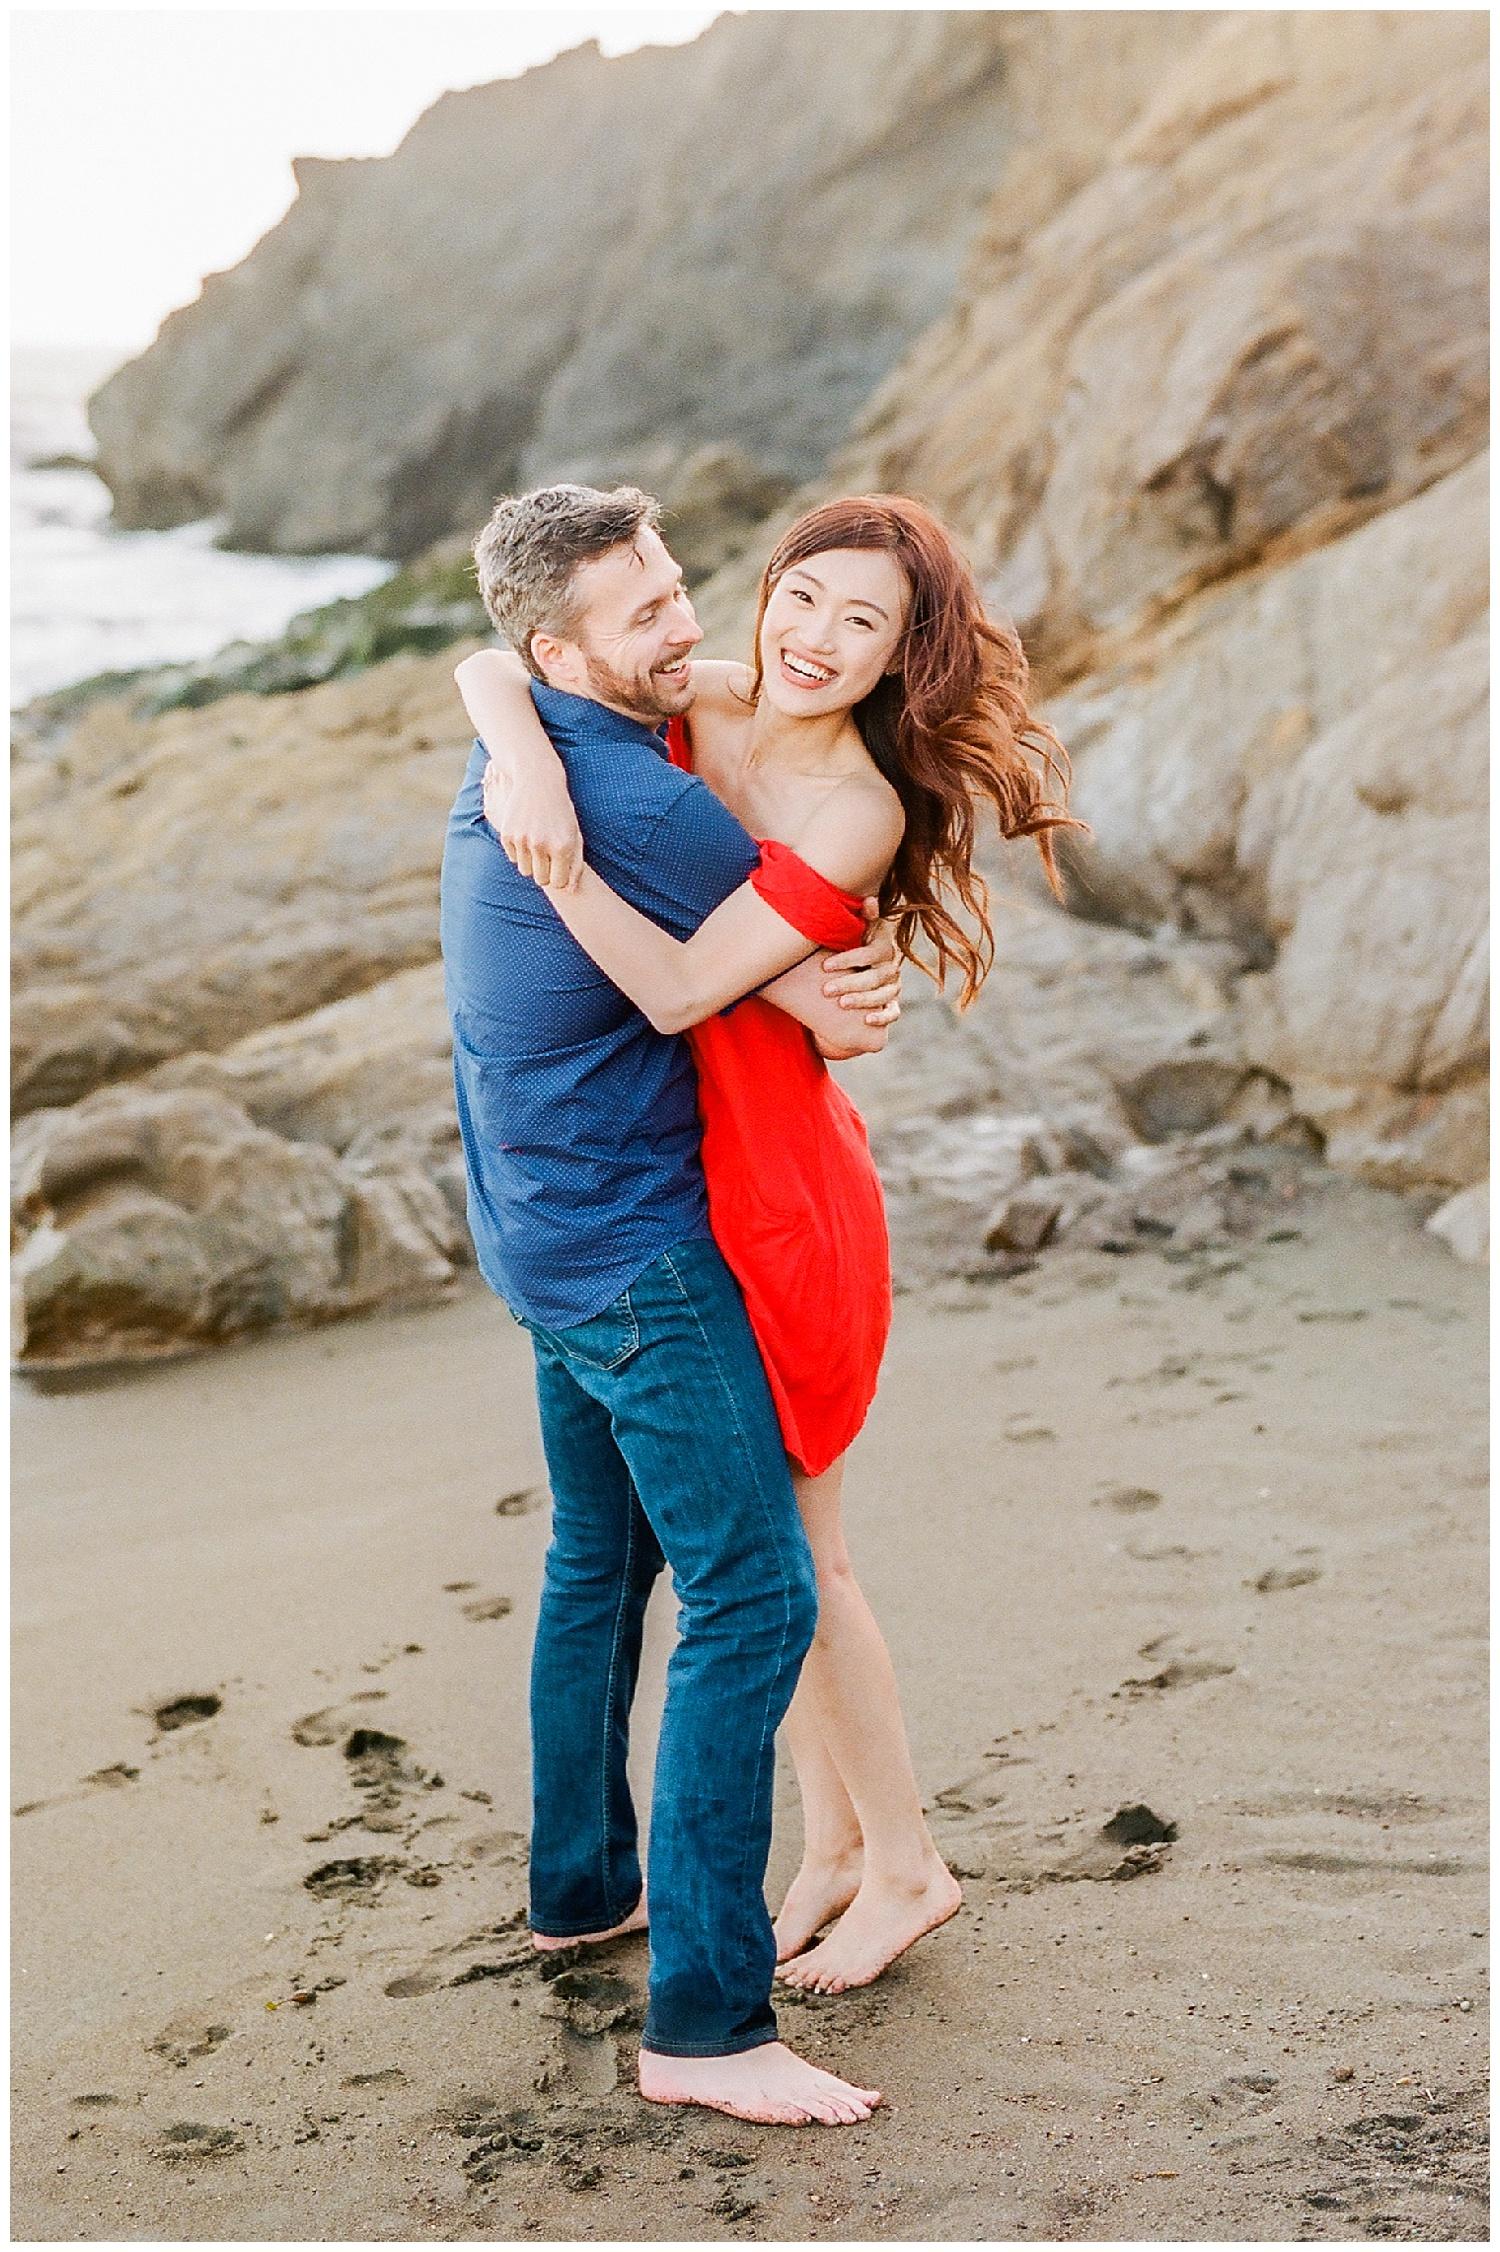 Janine_Licare_Photography_San_Francisco_Wedding_Photographer_0012.jpg